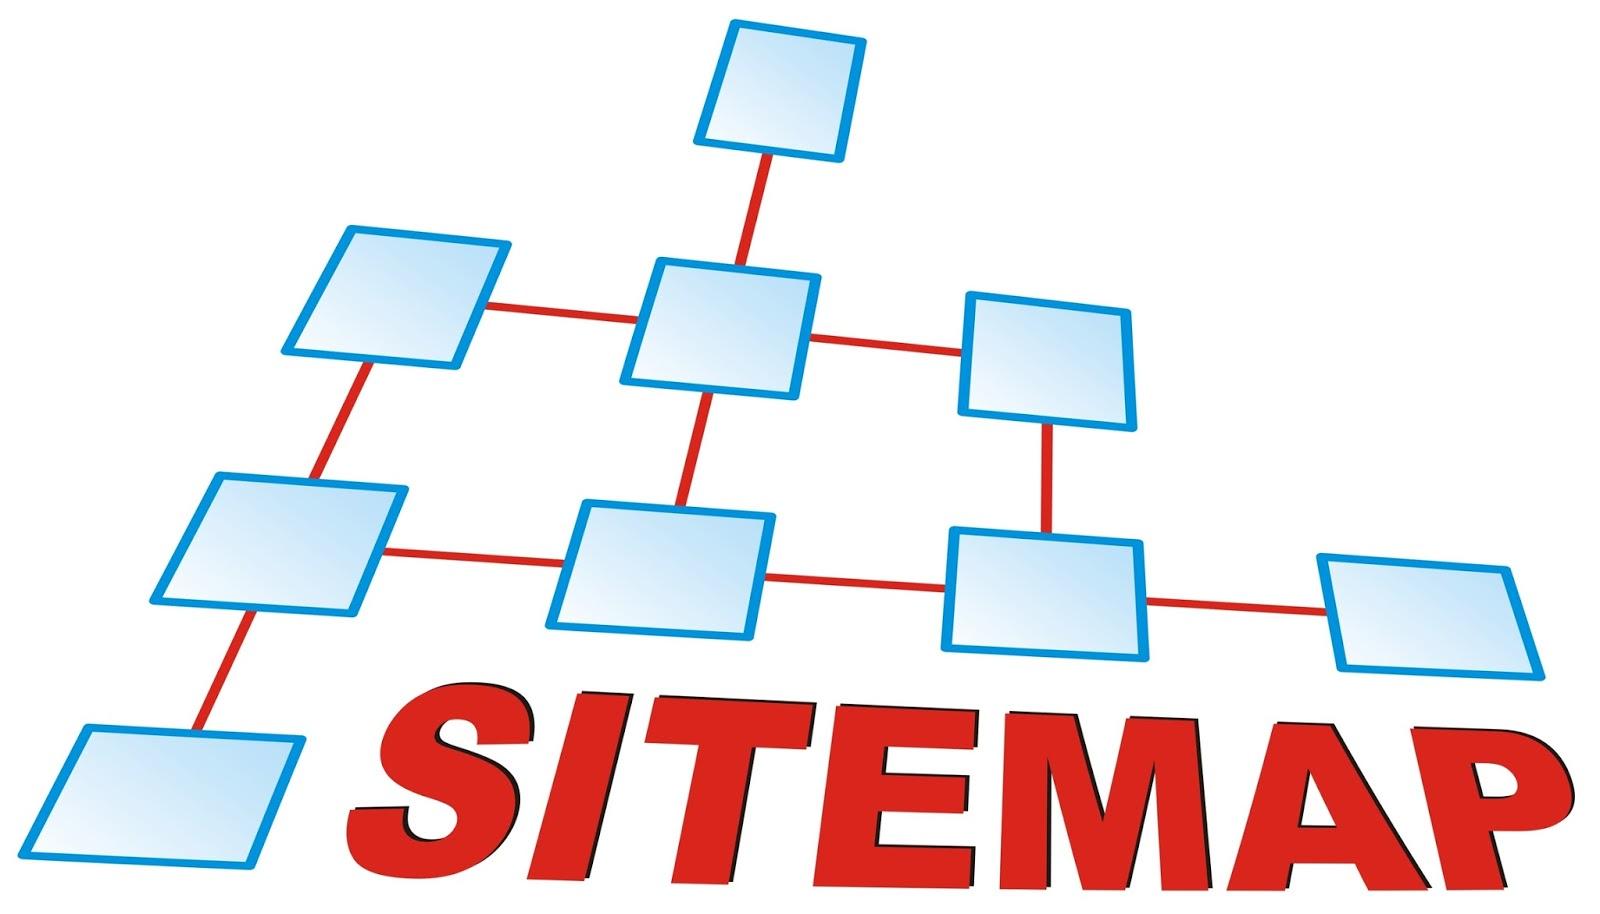 Add XML Sitemap to your Wordpress Site